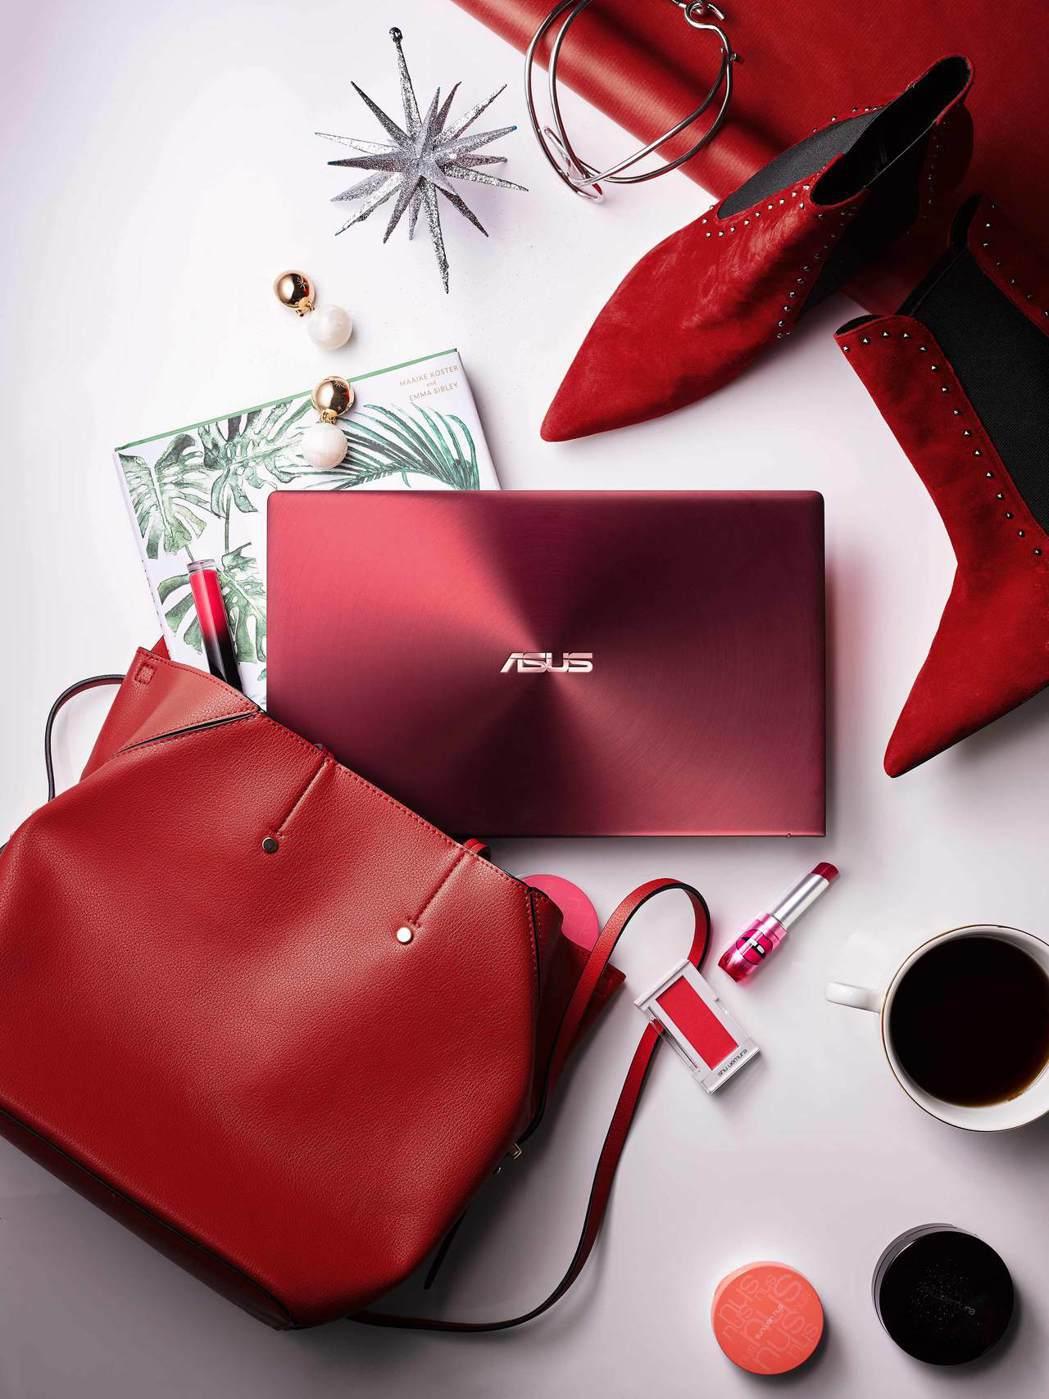 ASUS ZenBook 13勃艮第紅新色即日起上市。 華碩/提供